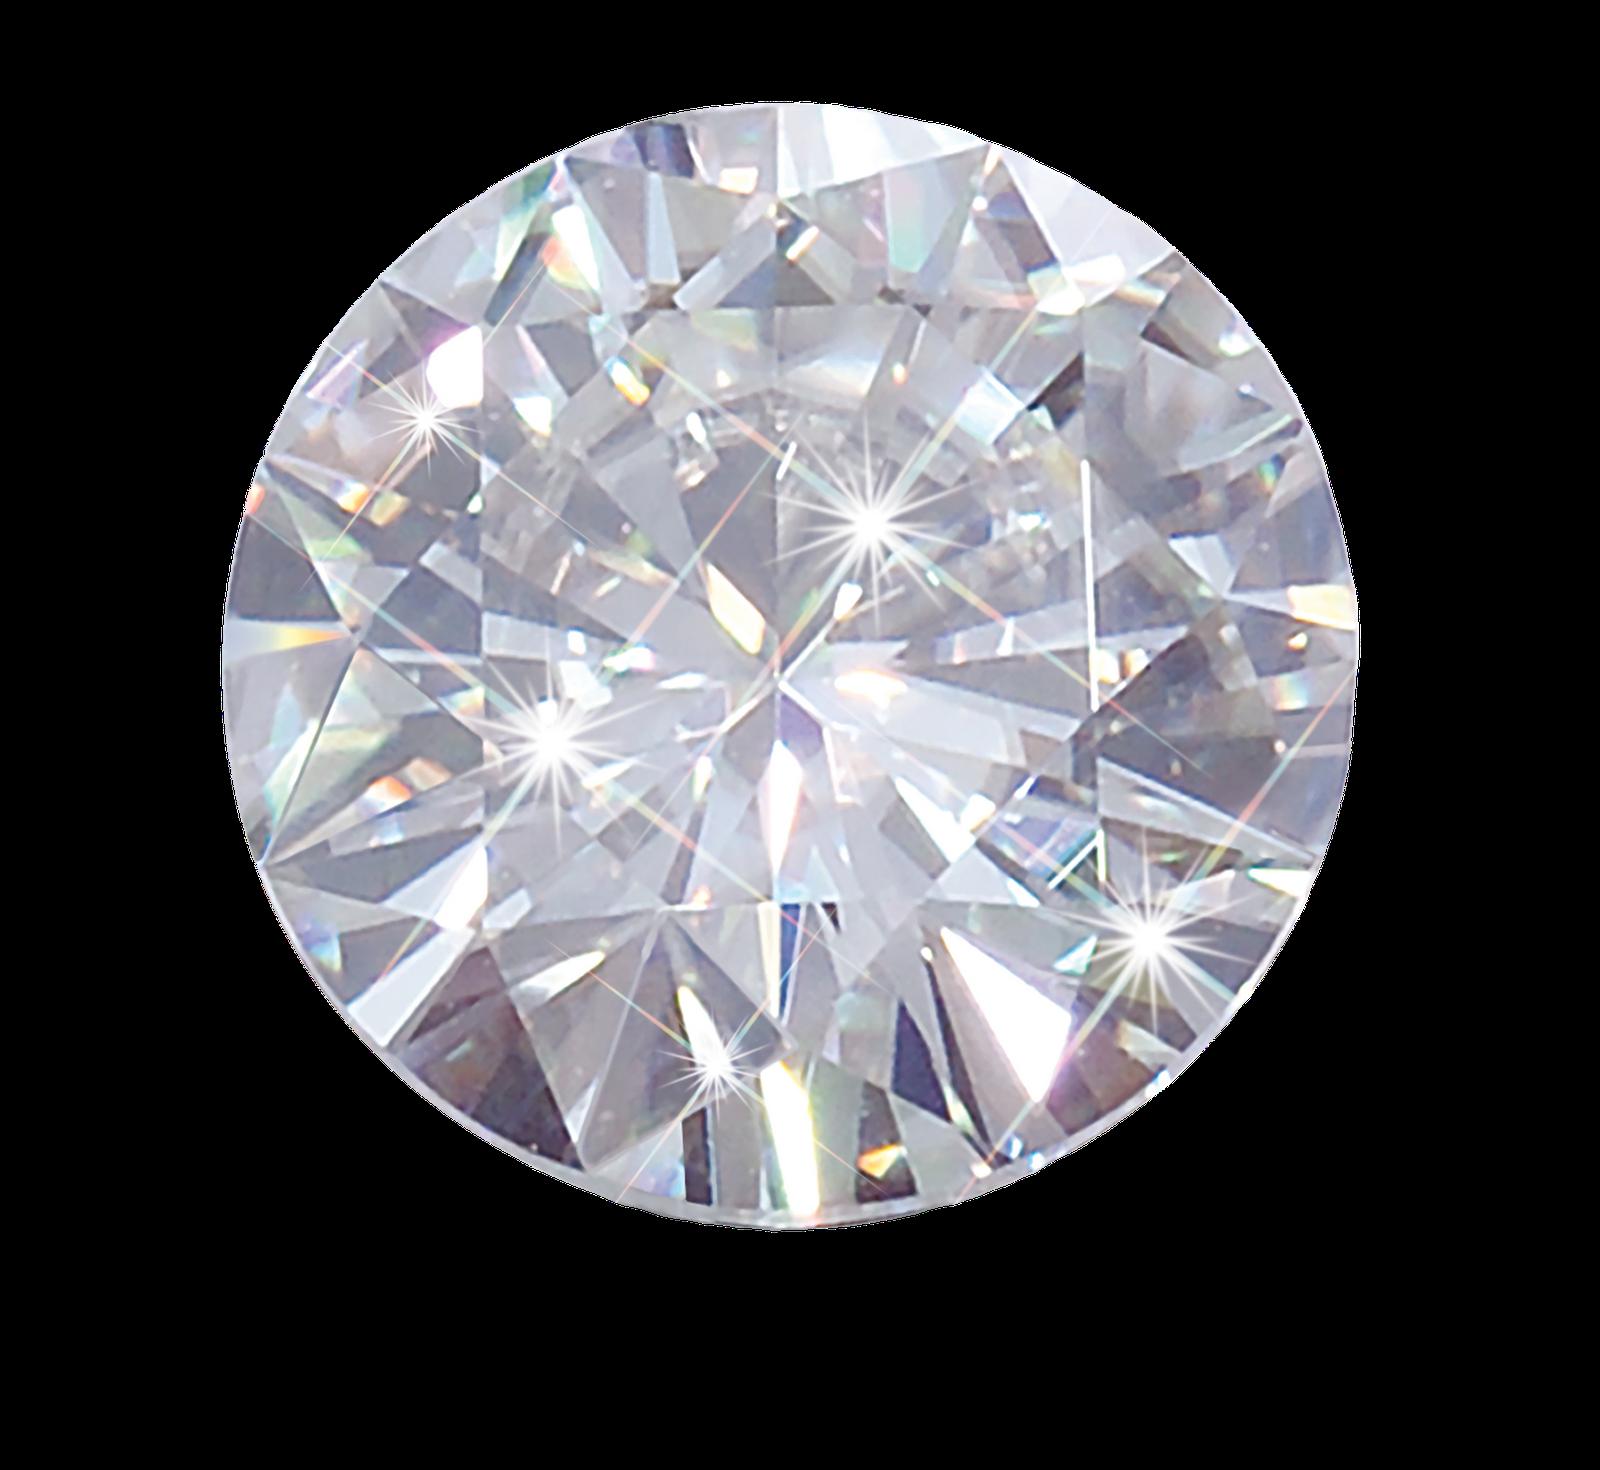 Diamond HD PNG - 120185